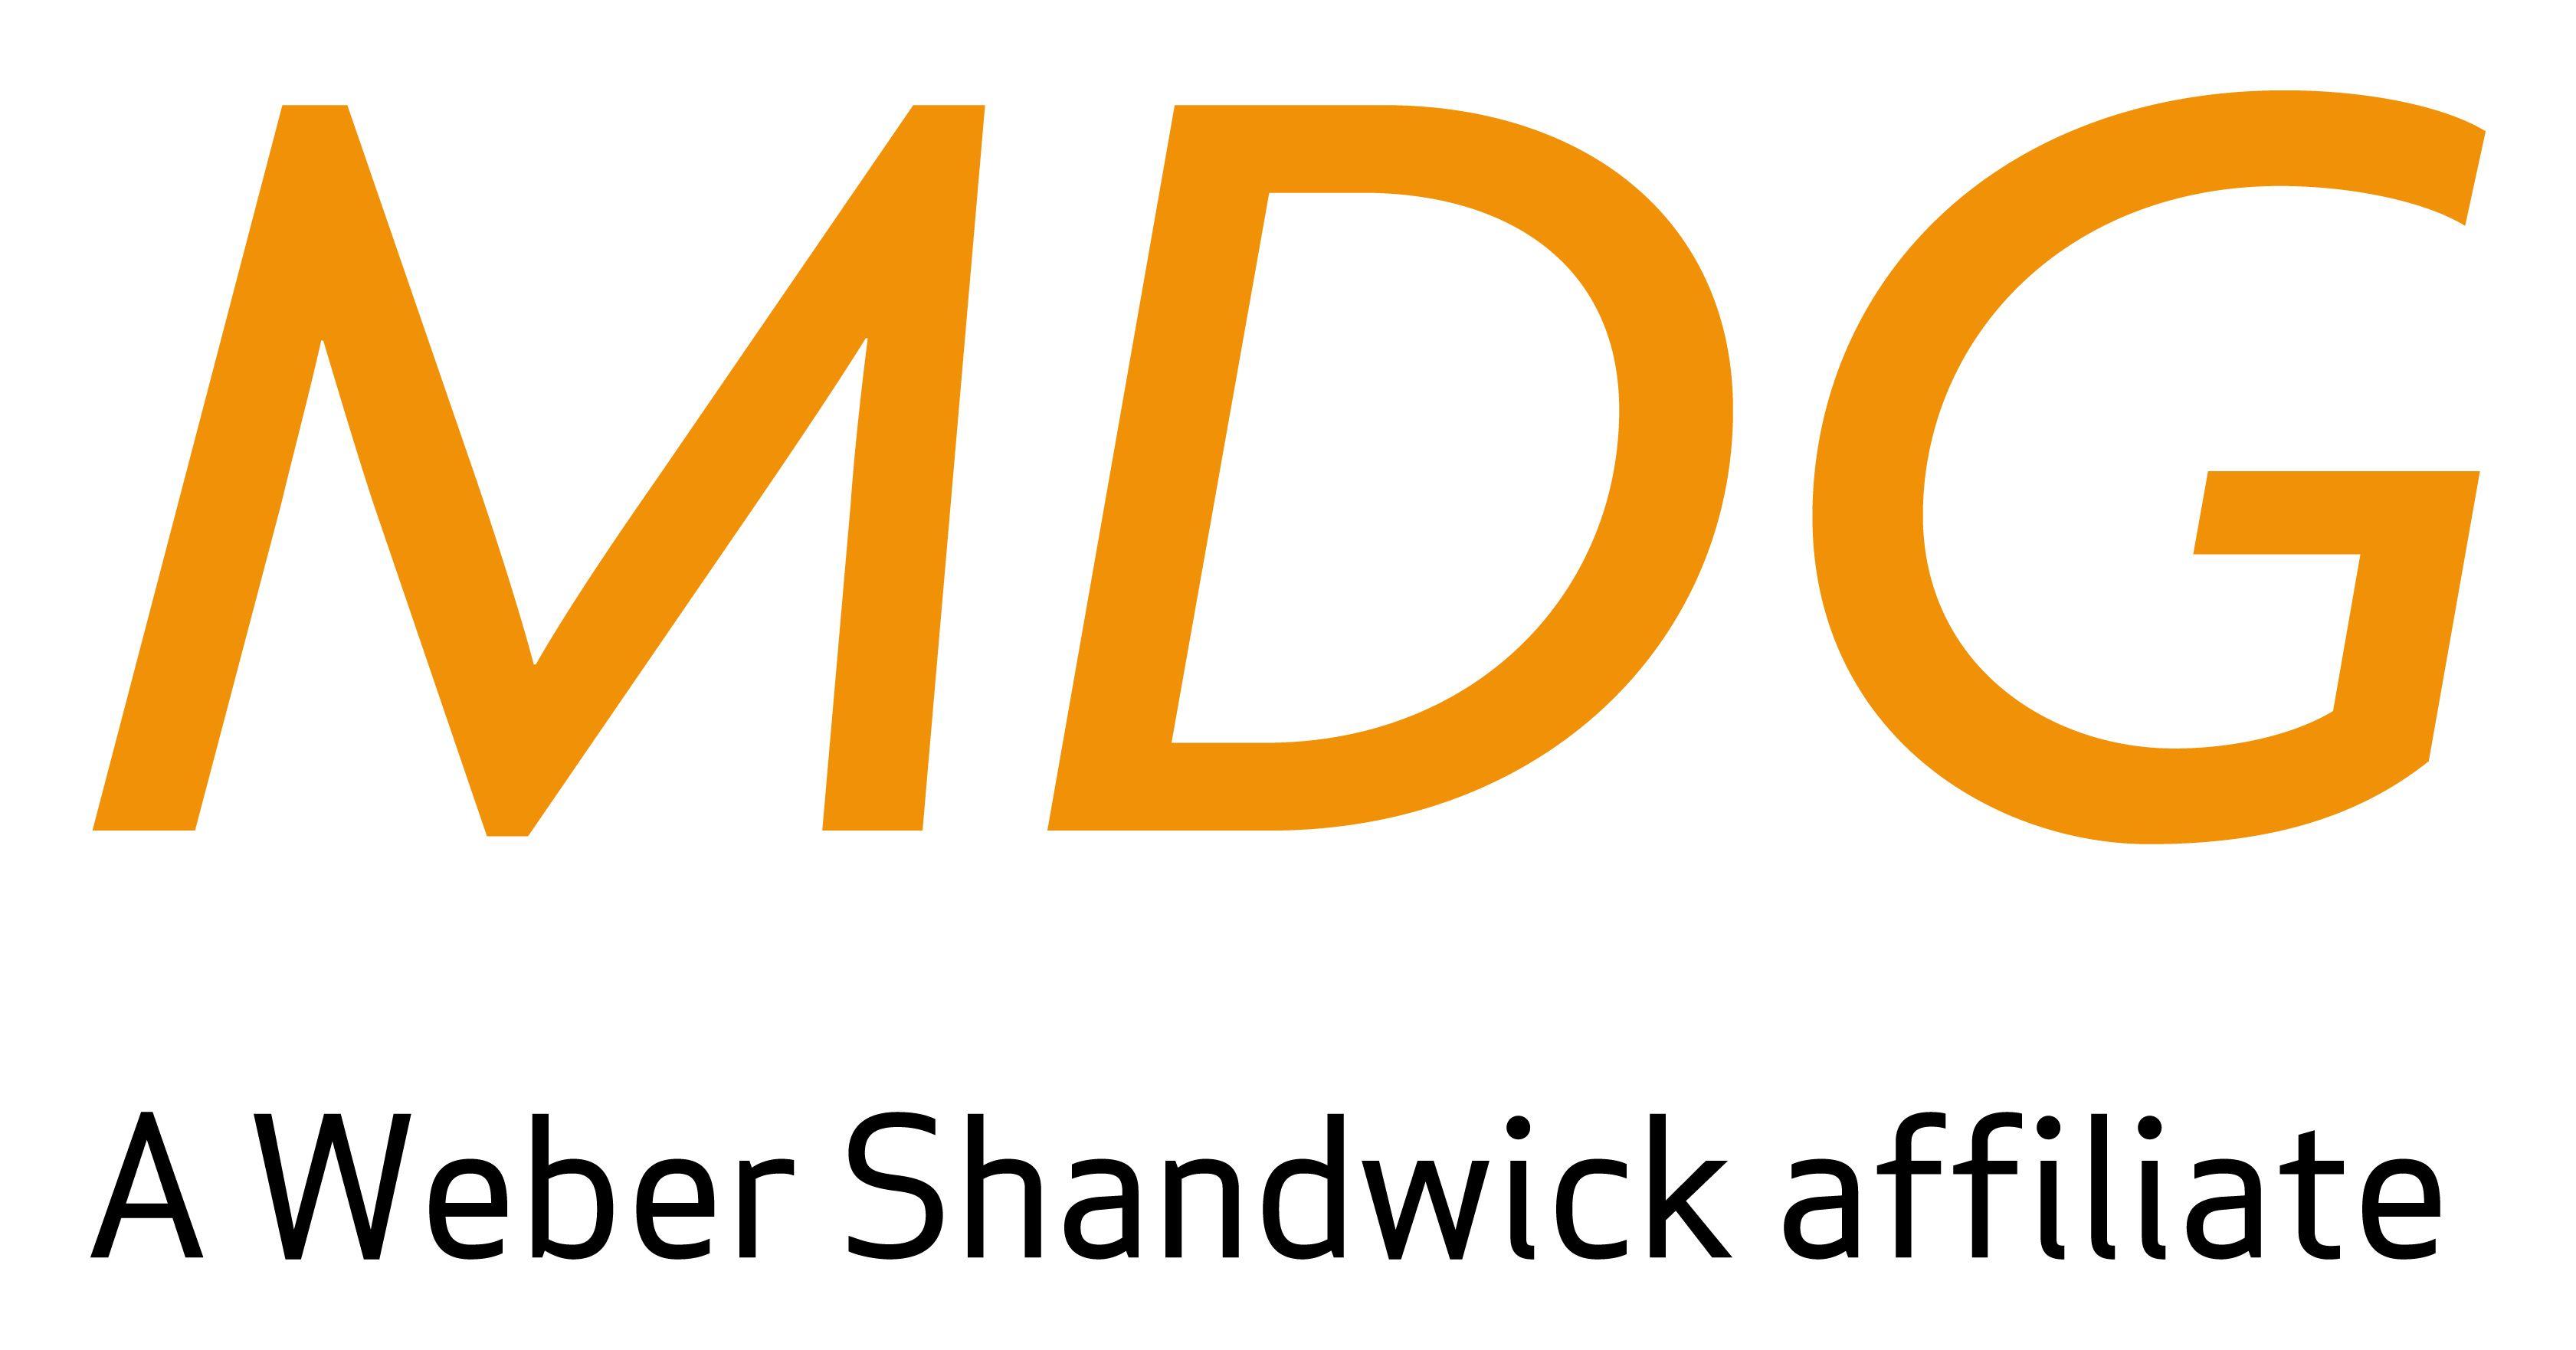 MDG Weber Shandwick Aff. busca director/a